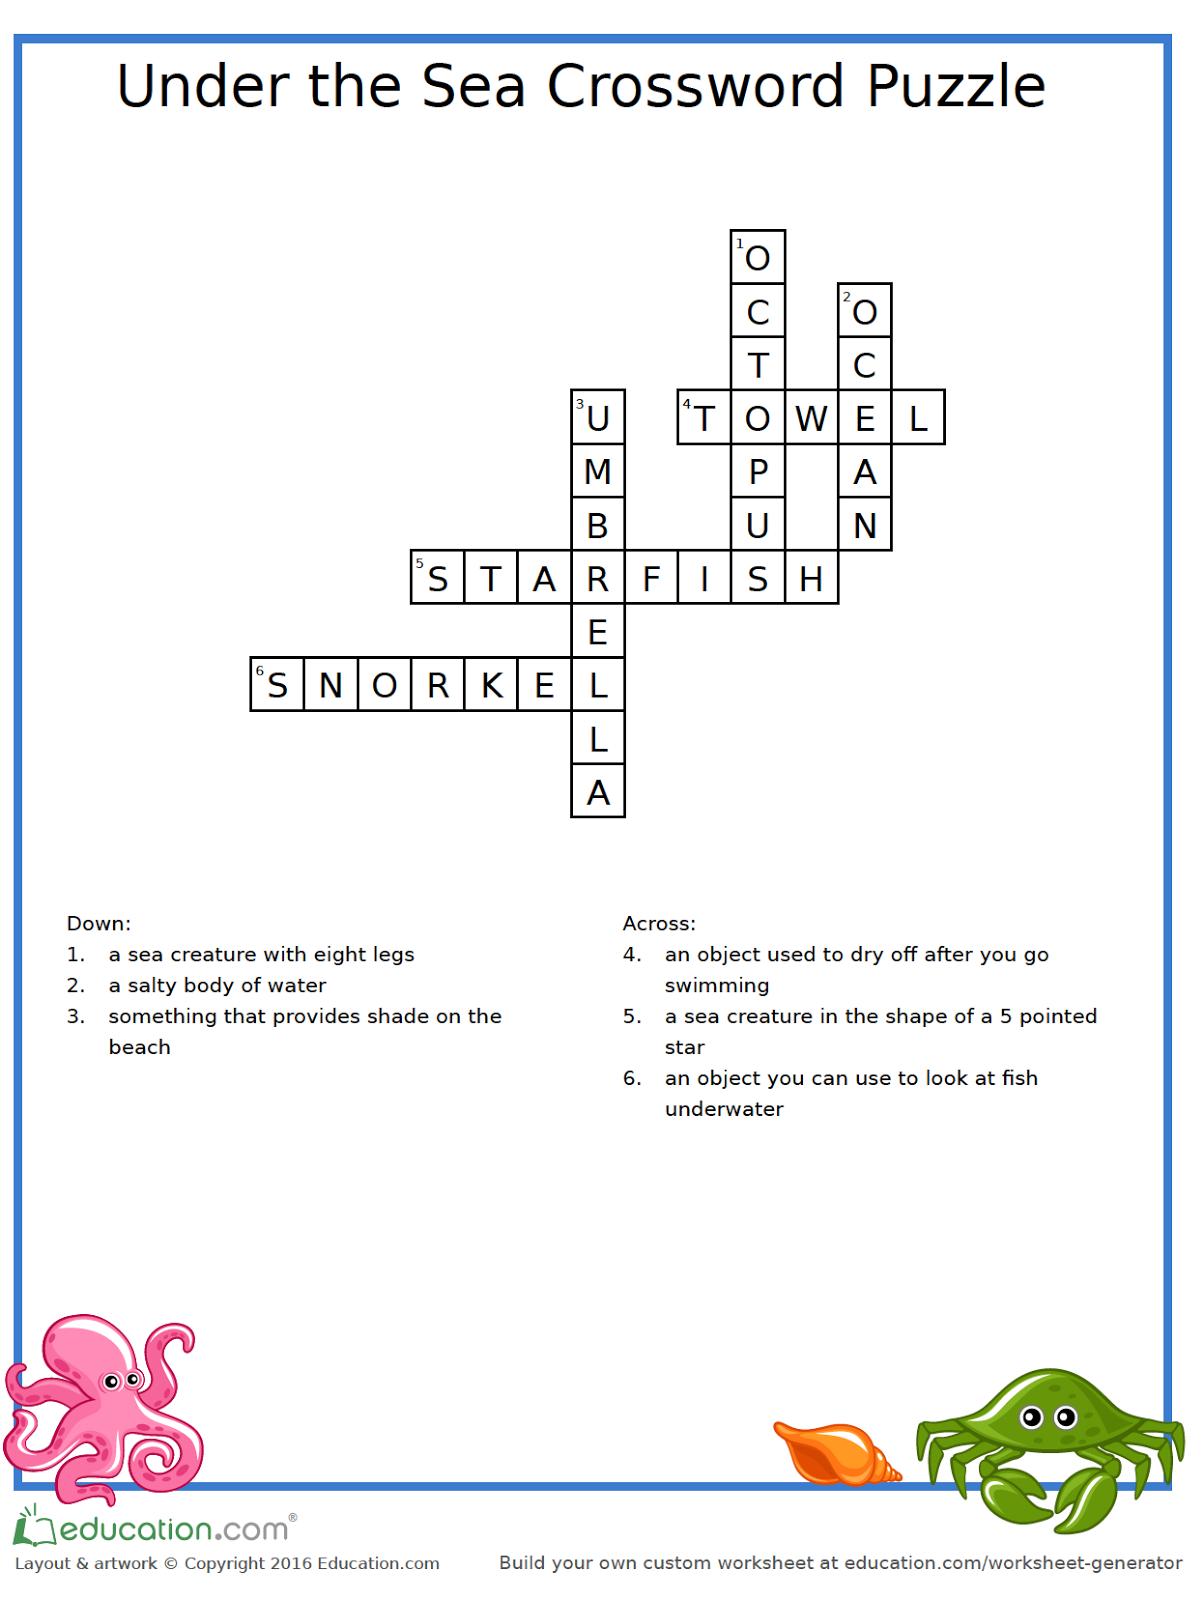 Kidz Learn Language Ready For More Vocabulary Fun Six